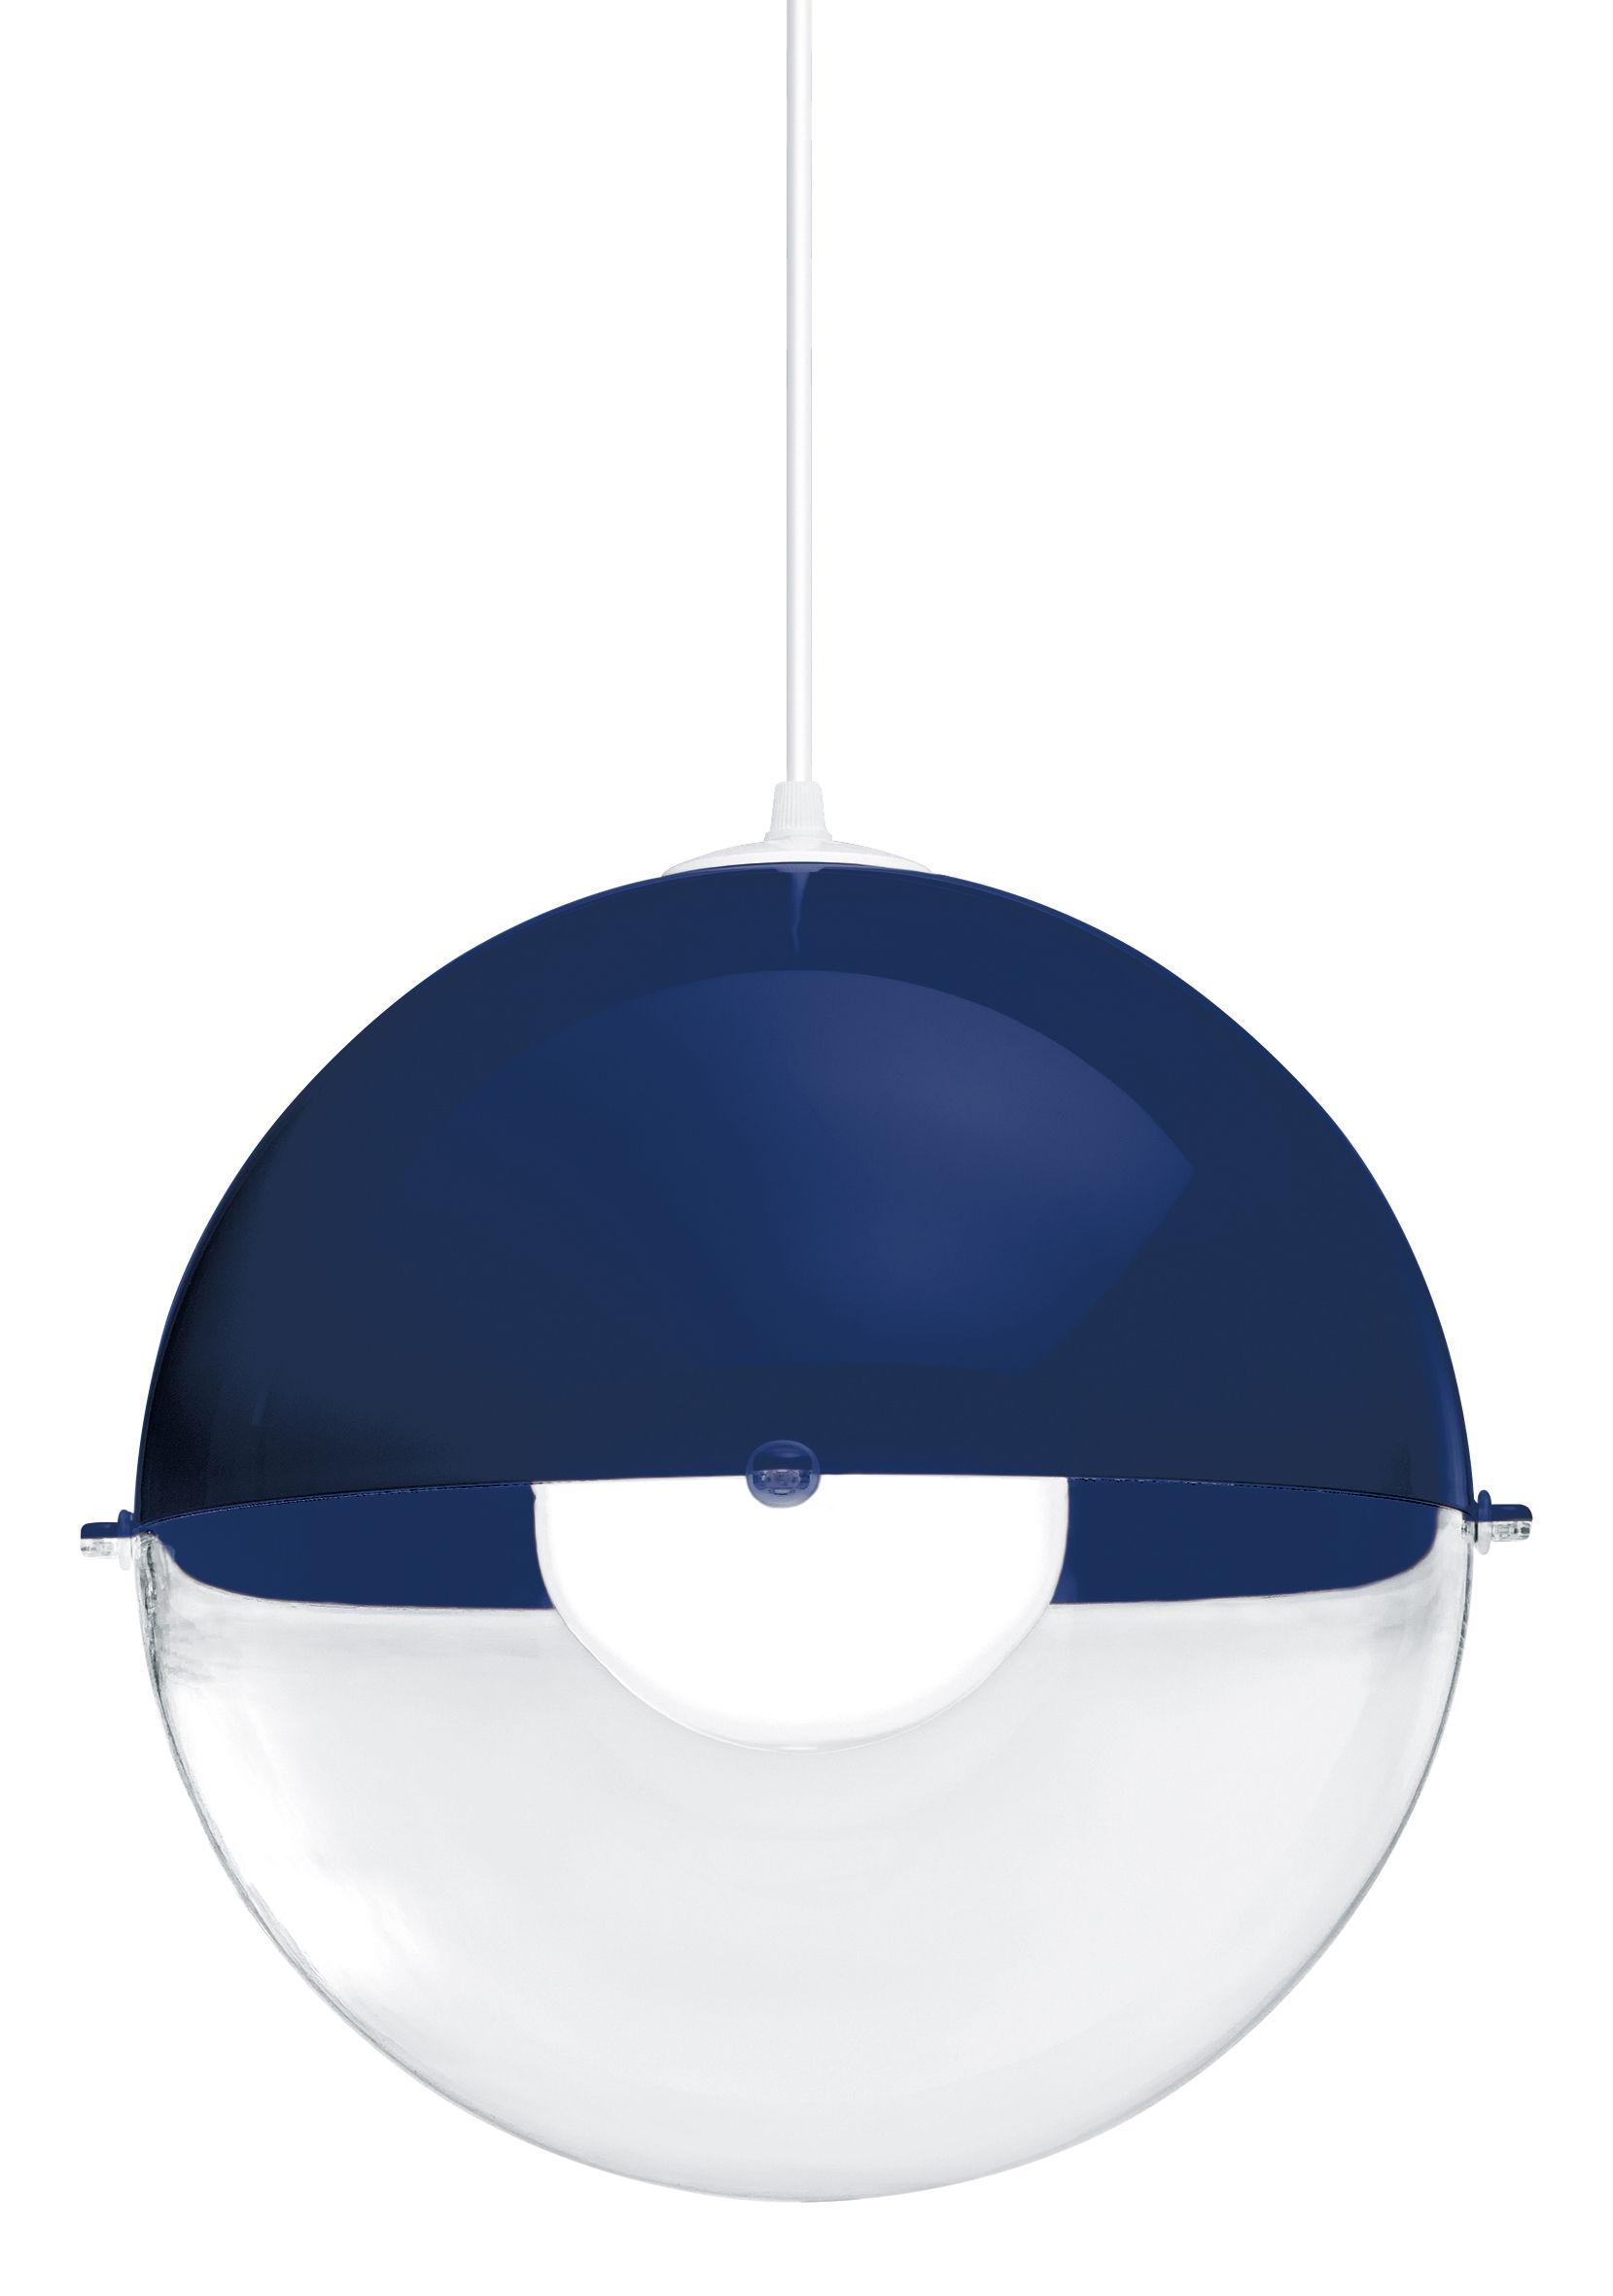 Luminaire - Suspensions - Suspension Orion / Ø 32 cm - Koziol - Bleu marine / Transparent - Polystyrène